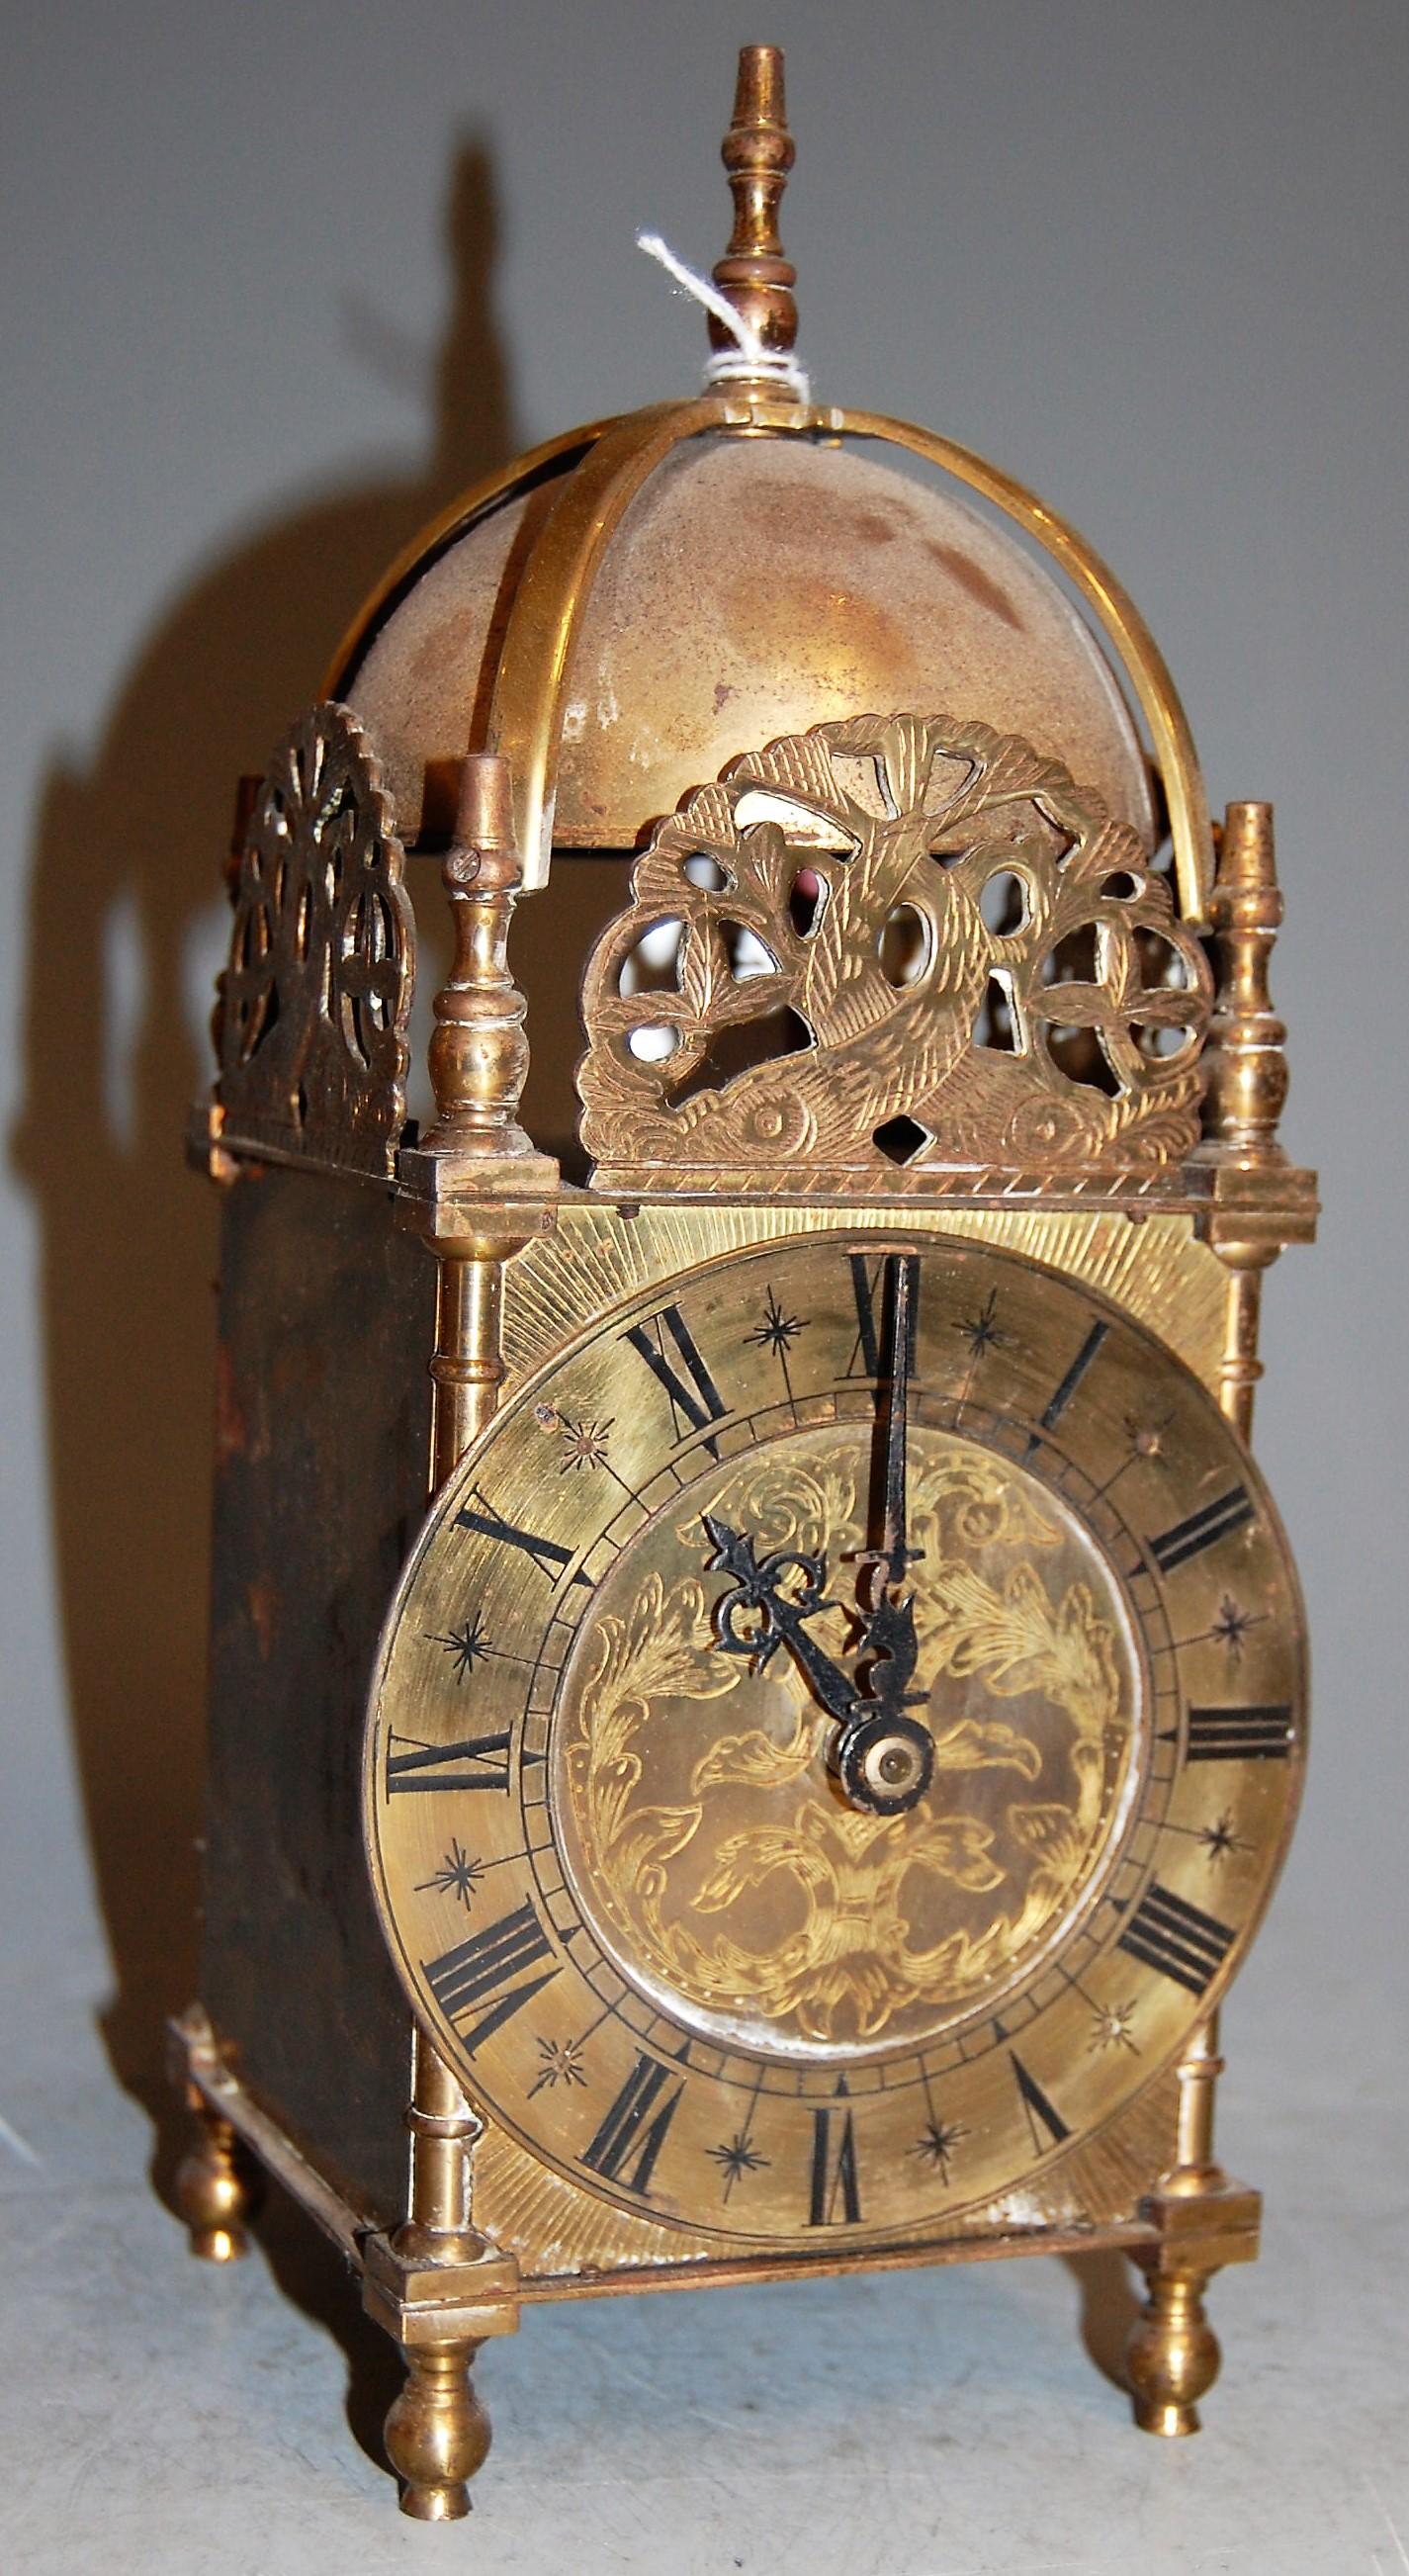 Lot 43 - A brass lantern clock in the 17th century style, h.26cm